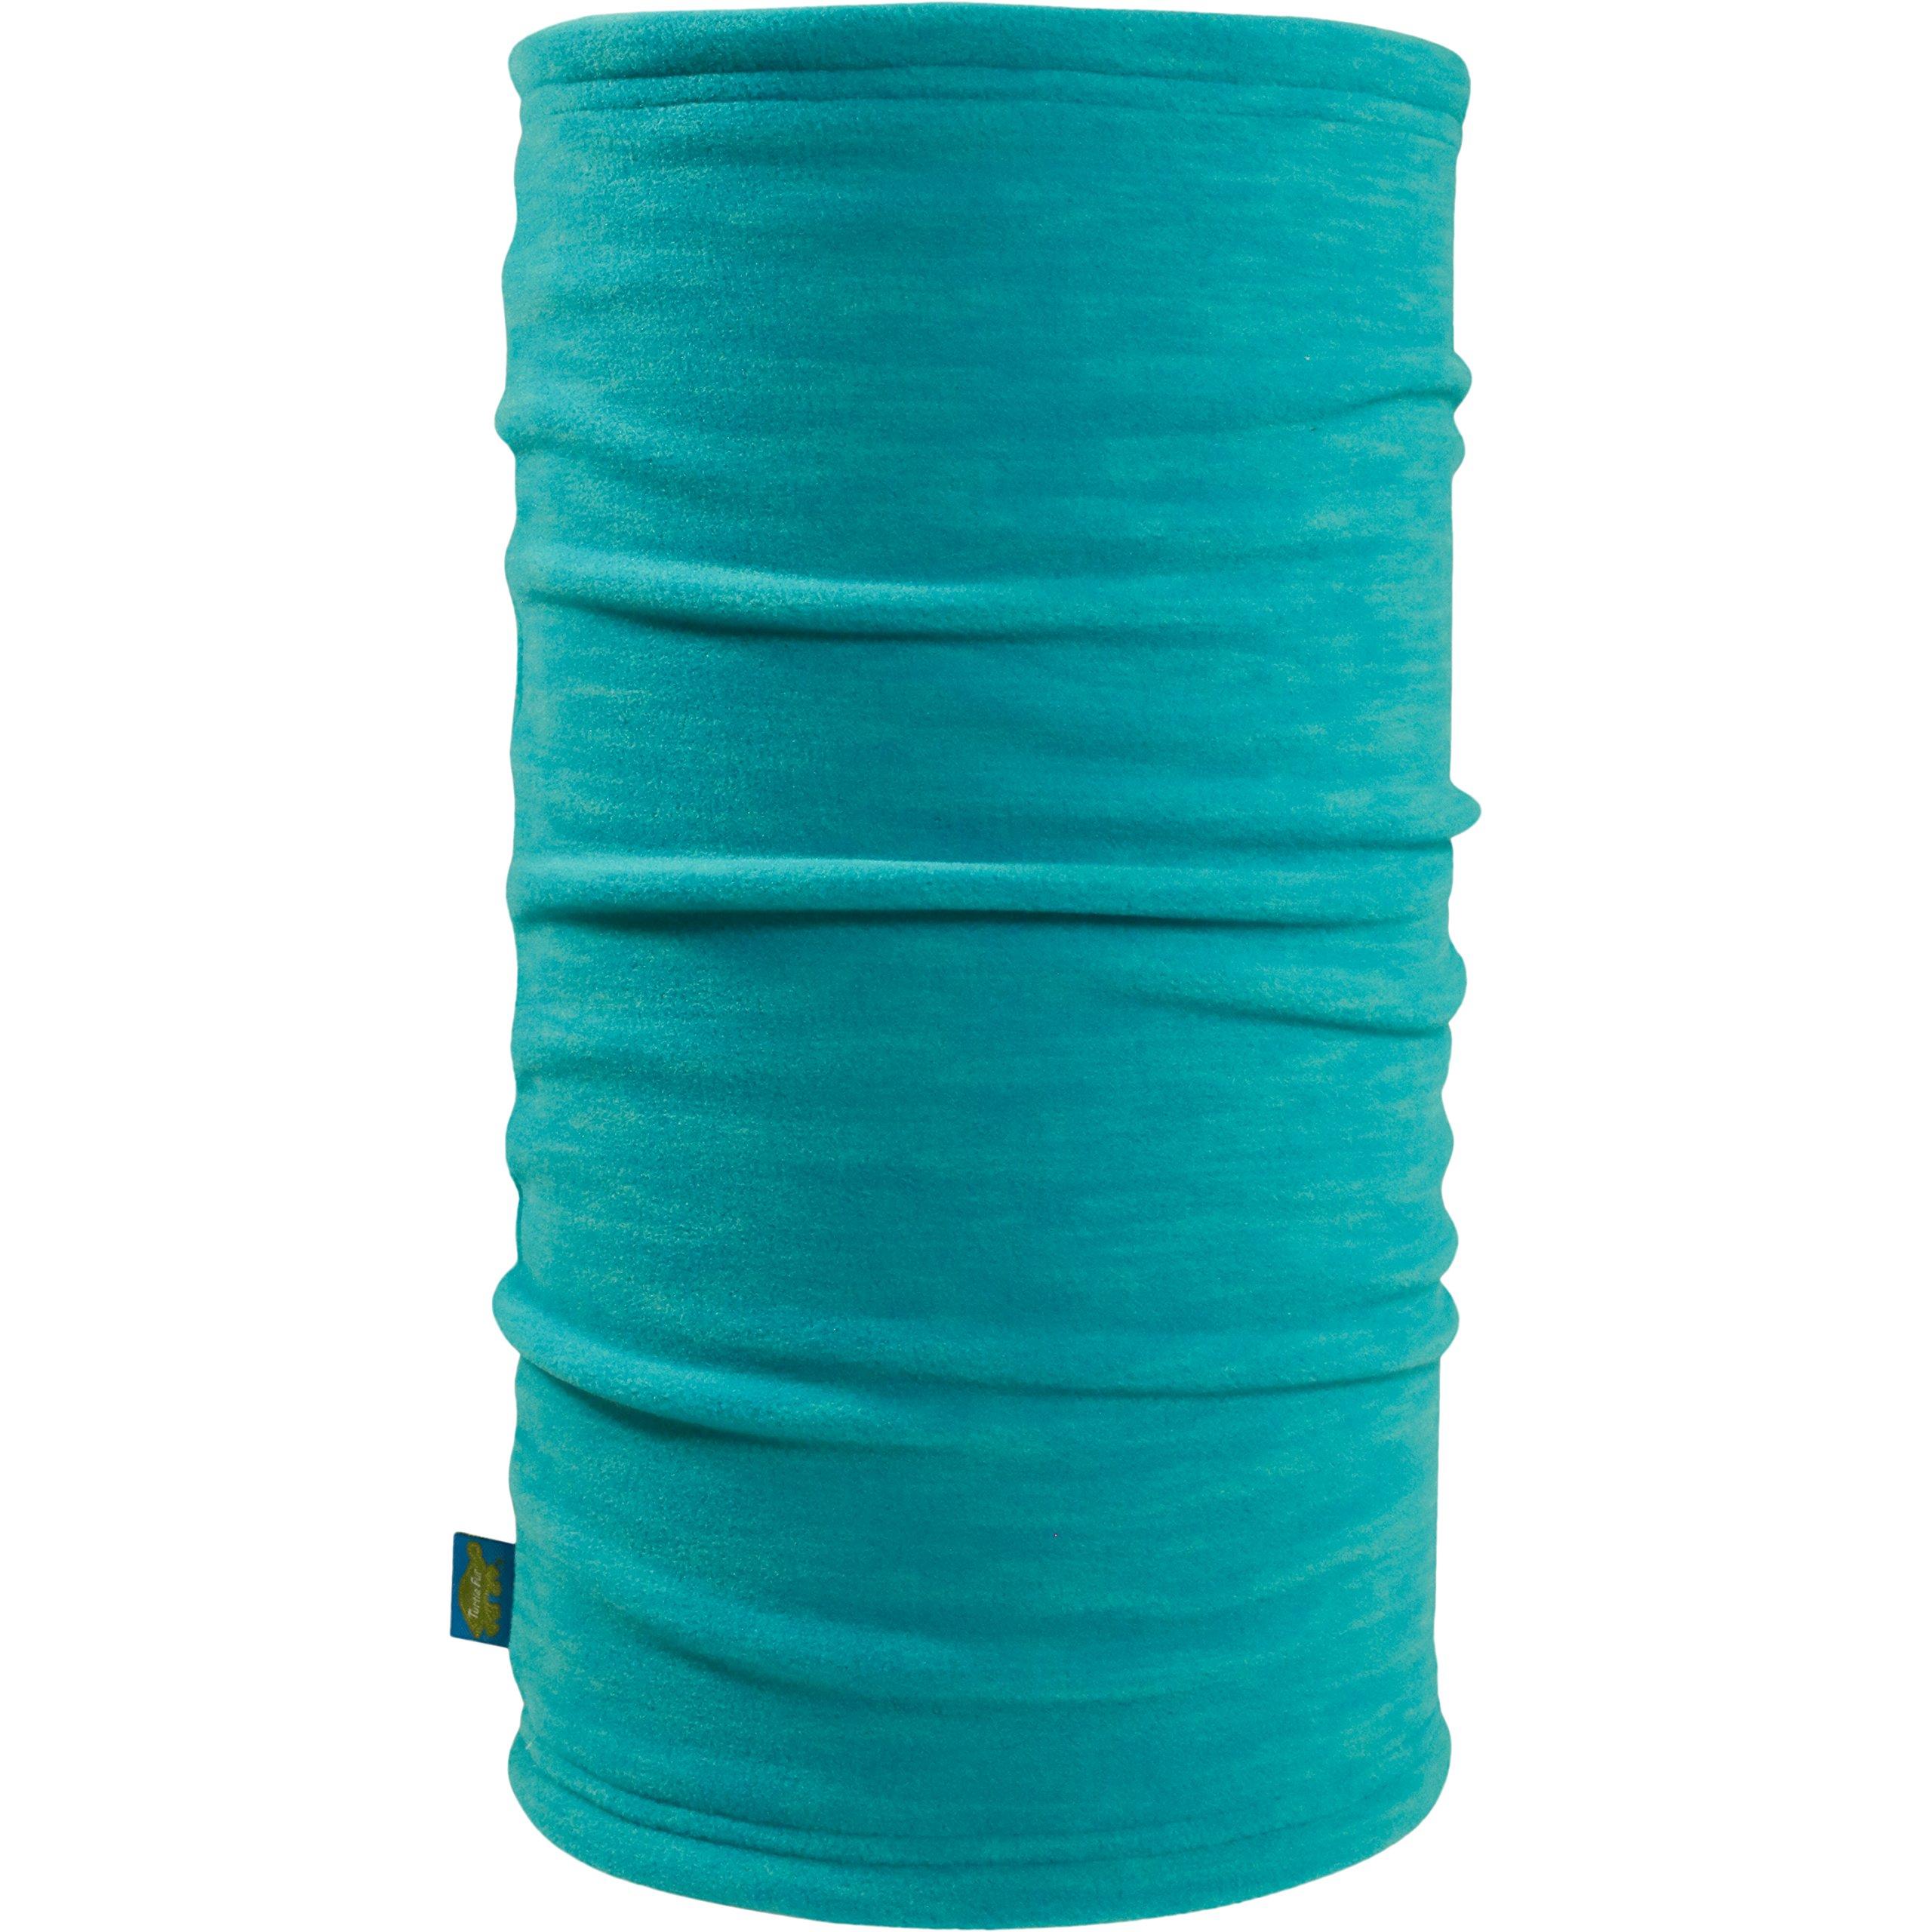 Turtle Fur Tube Midweight Polartec Thermal Pro Stria Fleece Neck Warmer, Wave, One Size